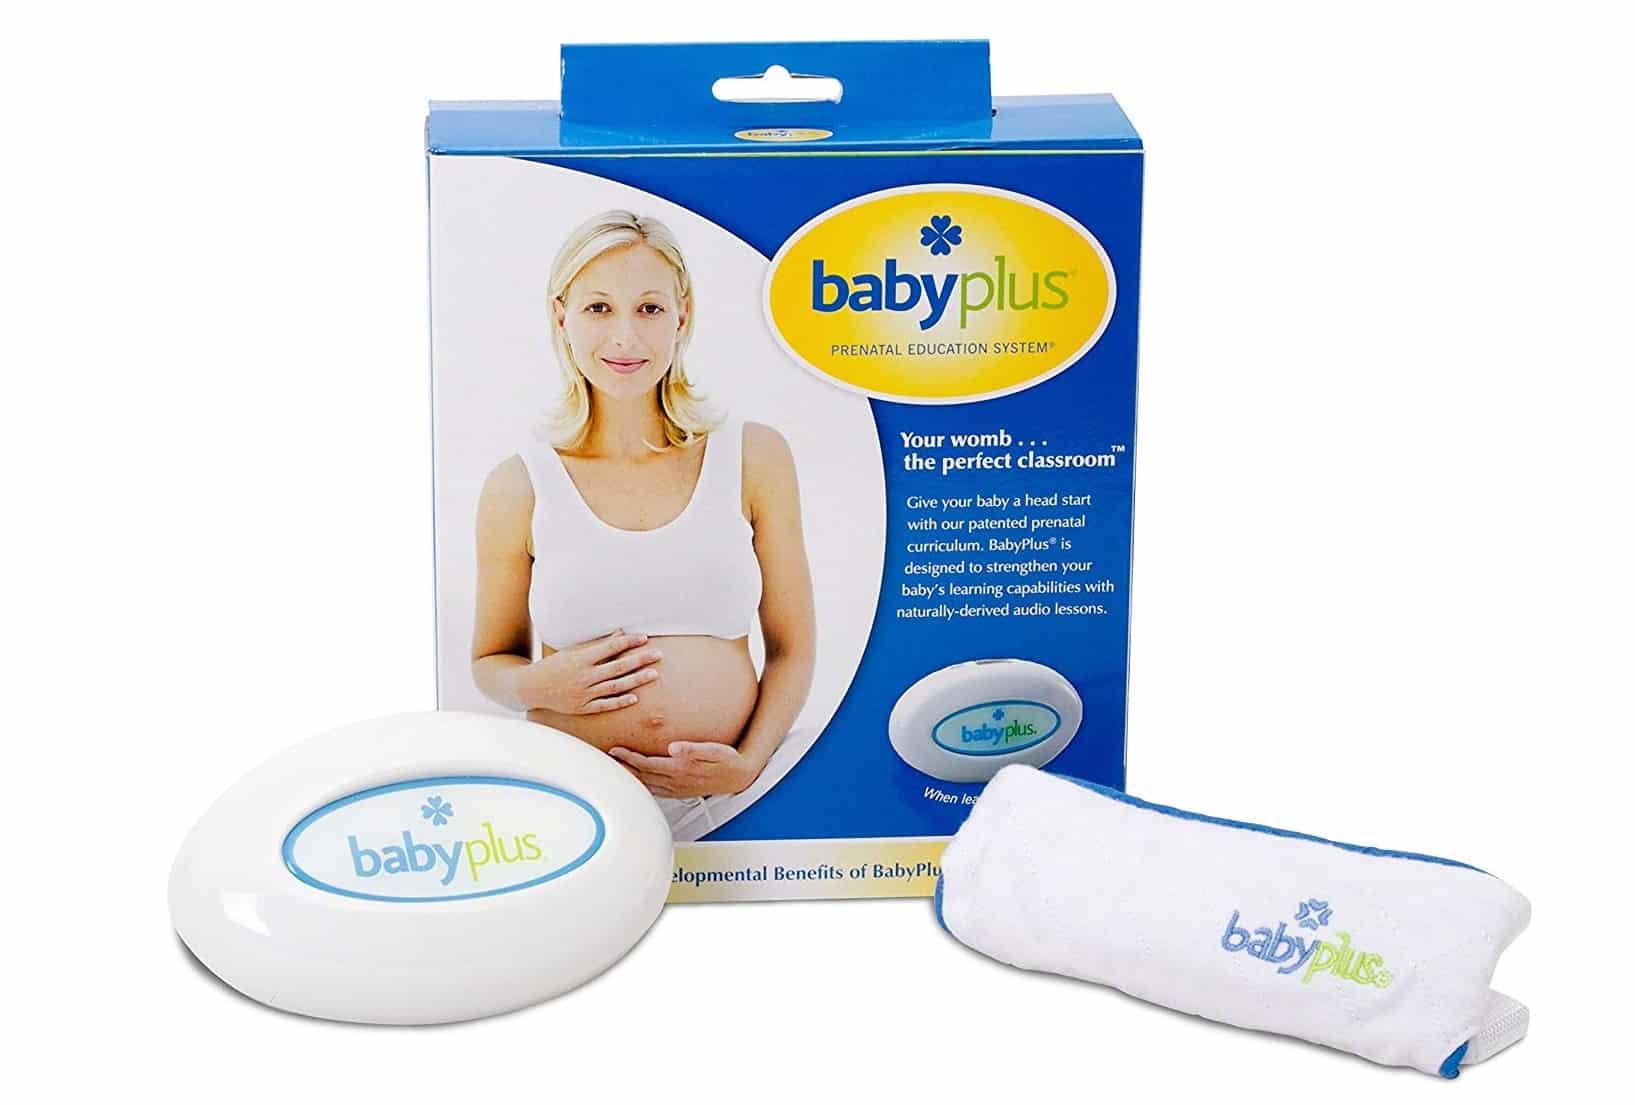 babyplus system